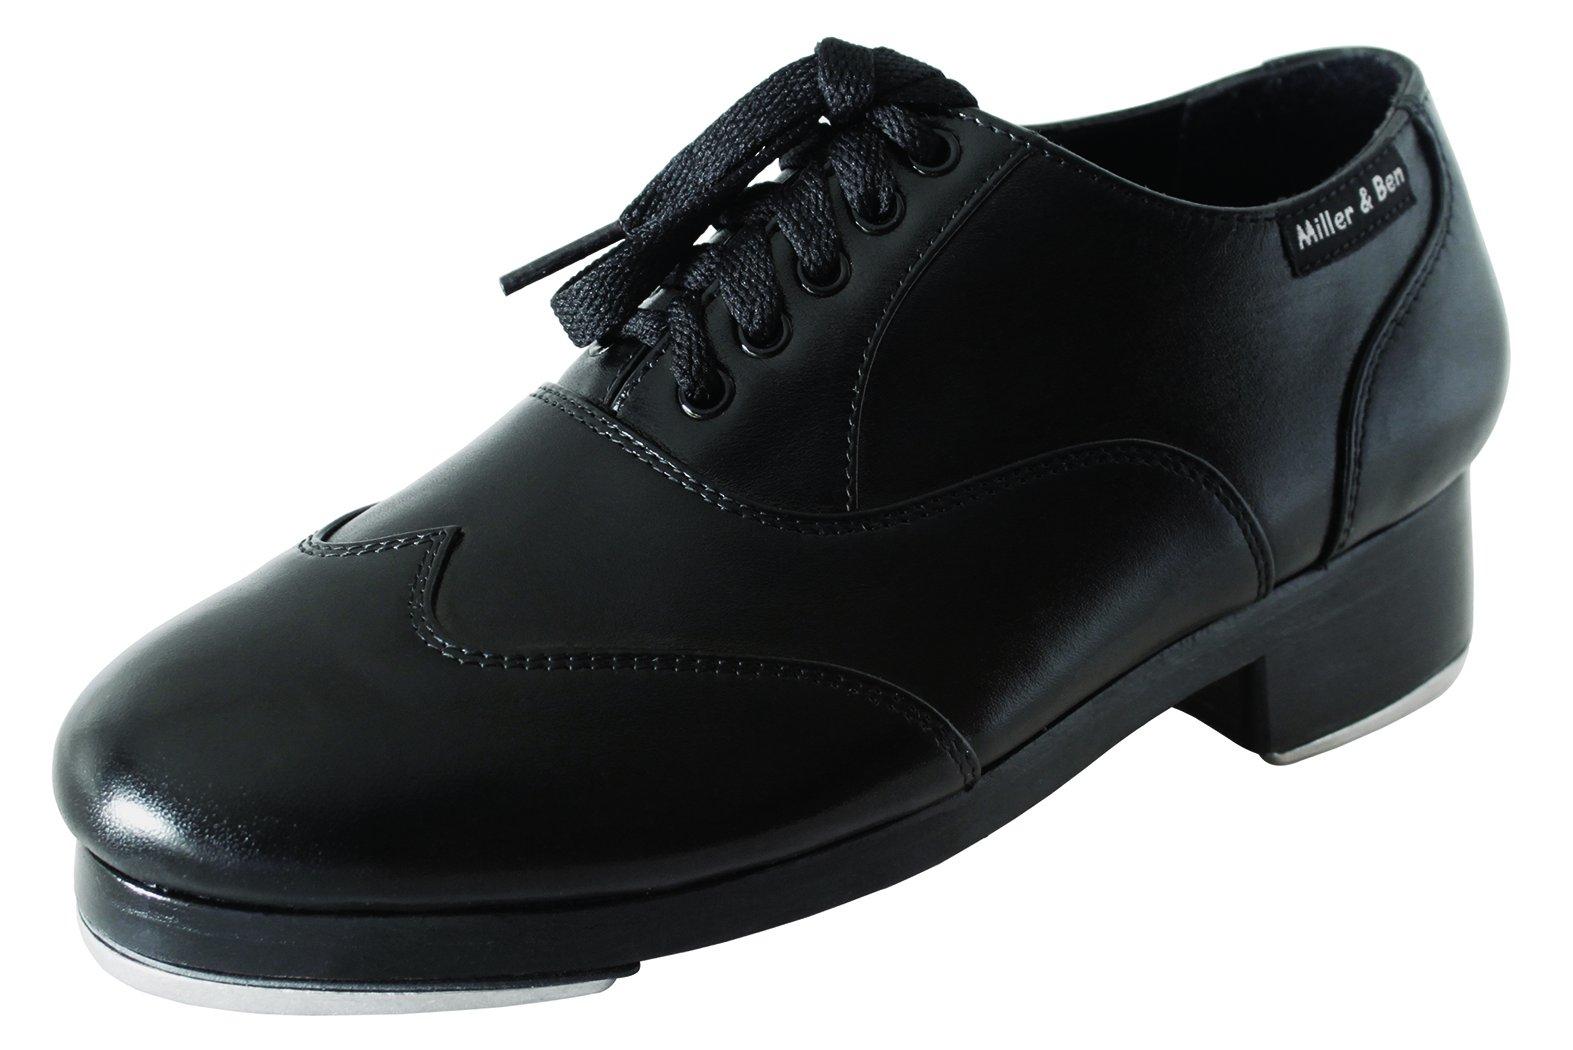 Miller & Ben Tap Shoes; Jazz-Tap Master; All Black - Wide Sizes (40 Wide) by Miller & Ben